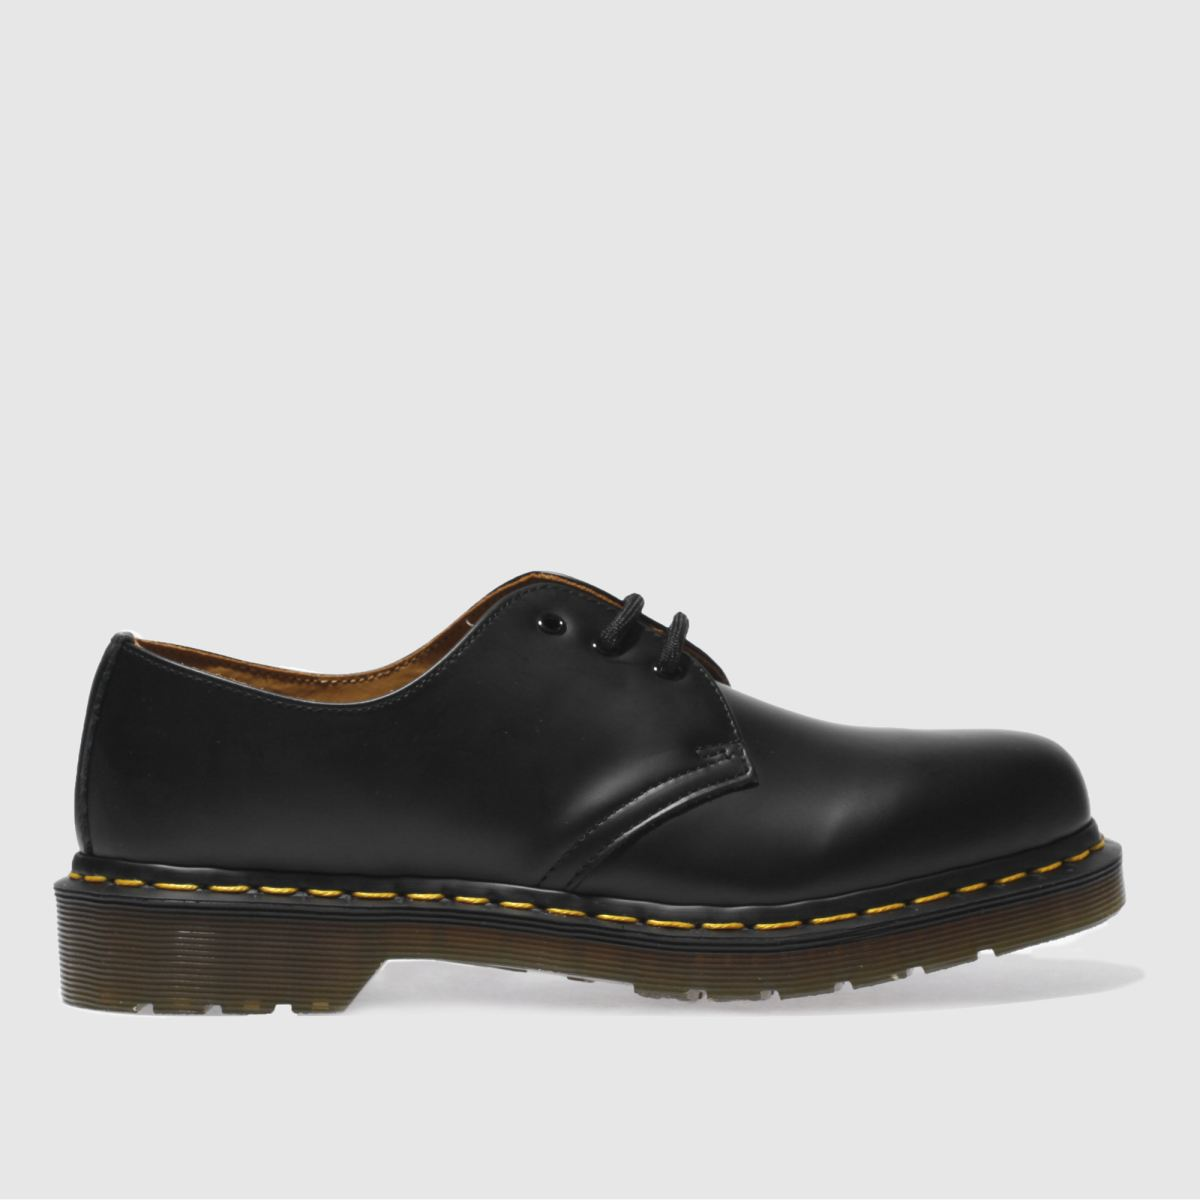 Dr Martens Shoe Polish Black